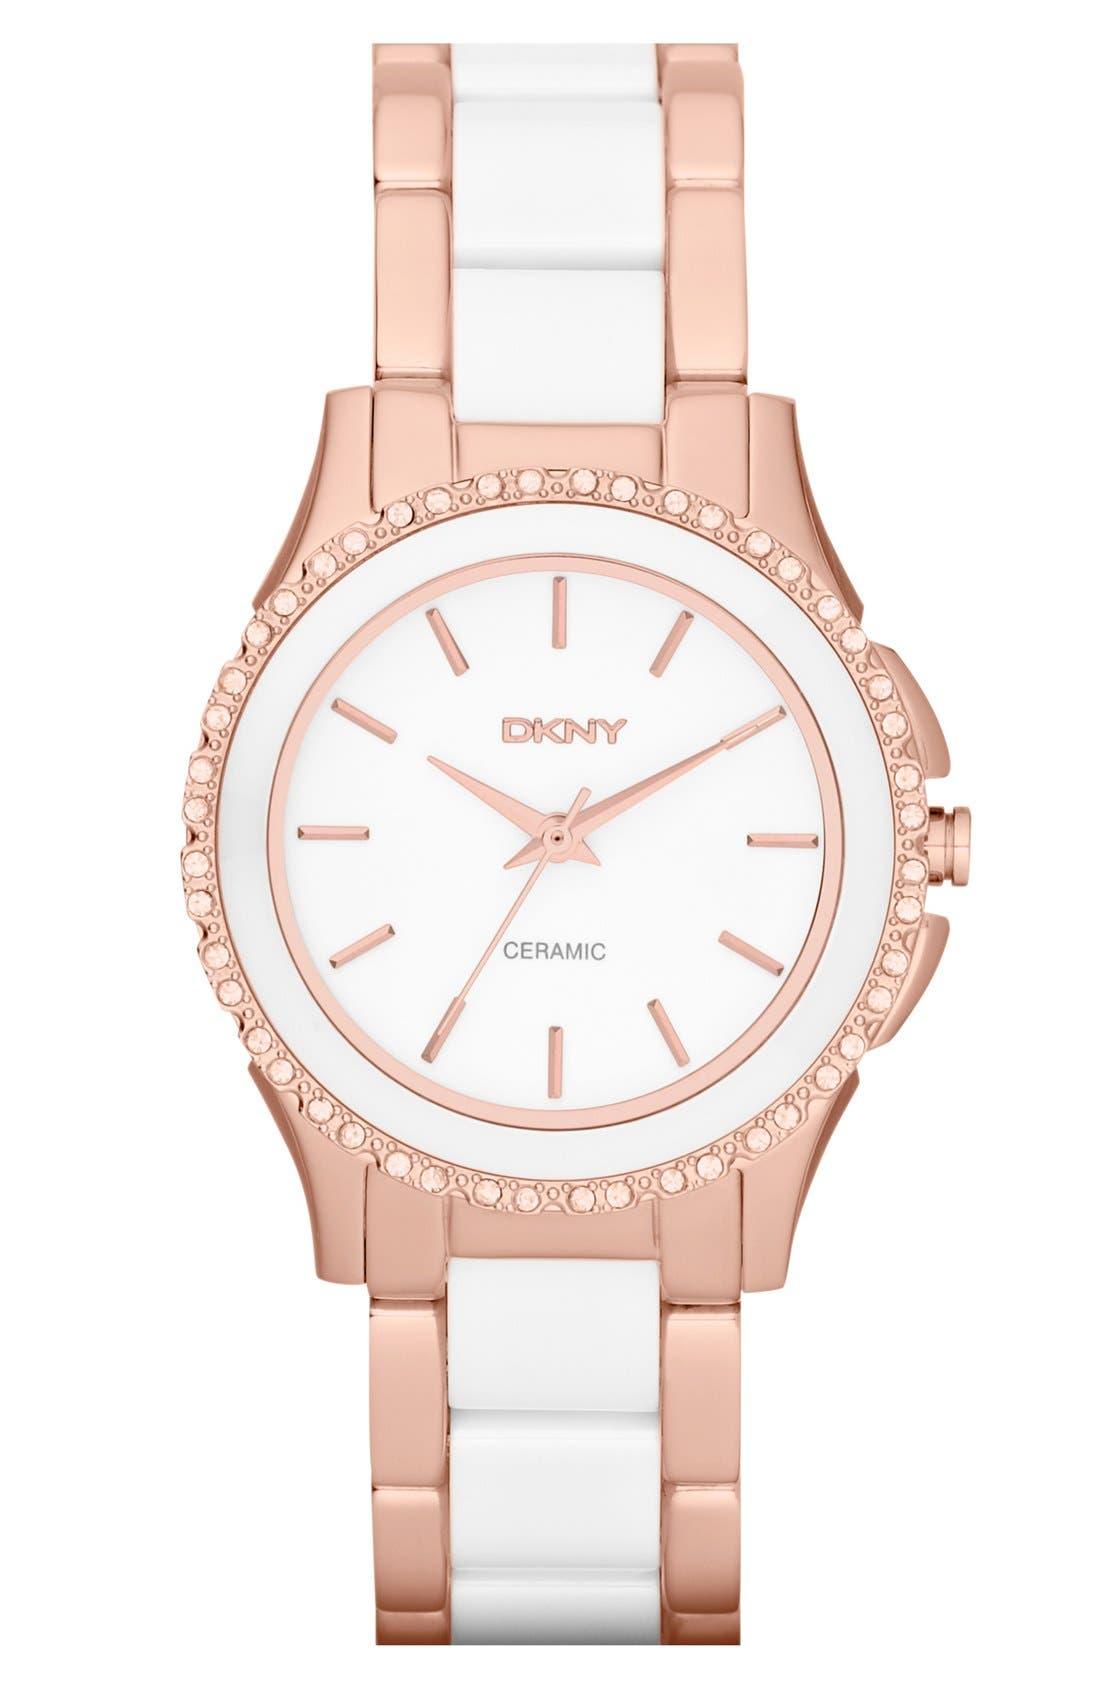 Alternate Image 1 Selected - DKNY 'Westside' Round Two Tone Ceramic Bracelet Watch, 32mm